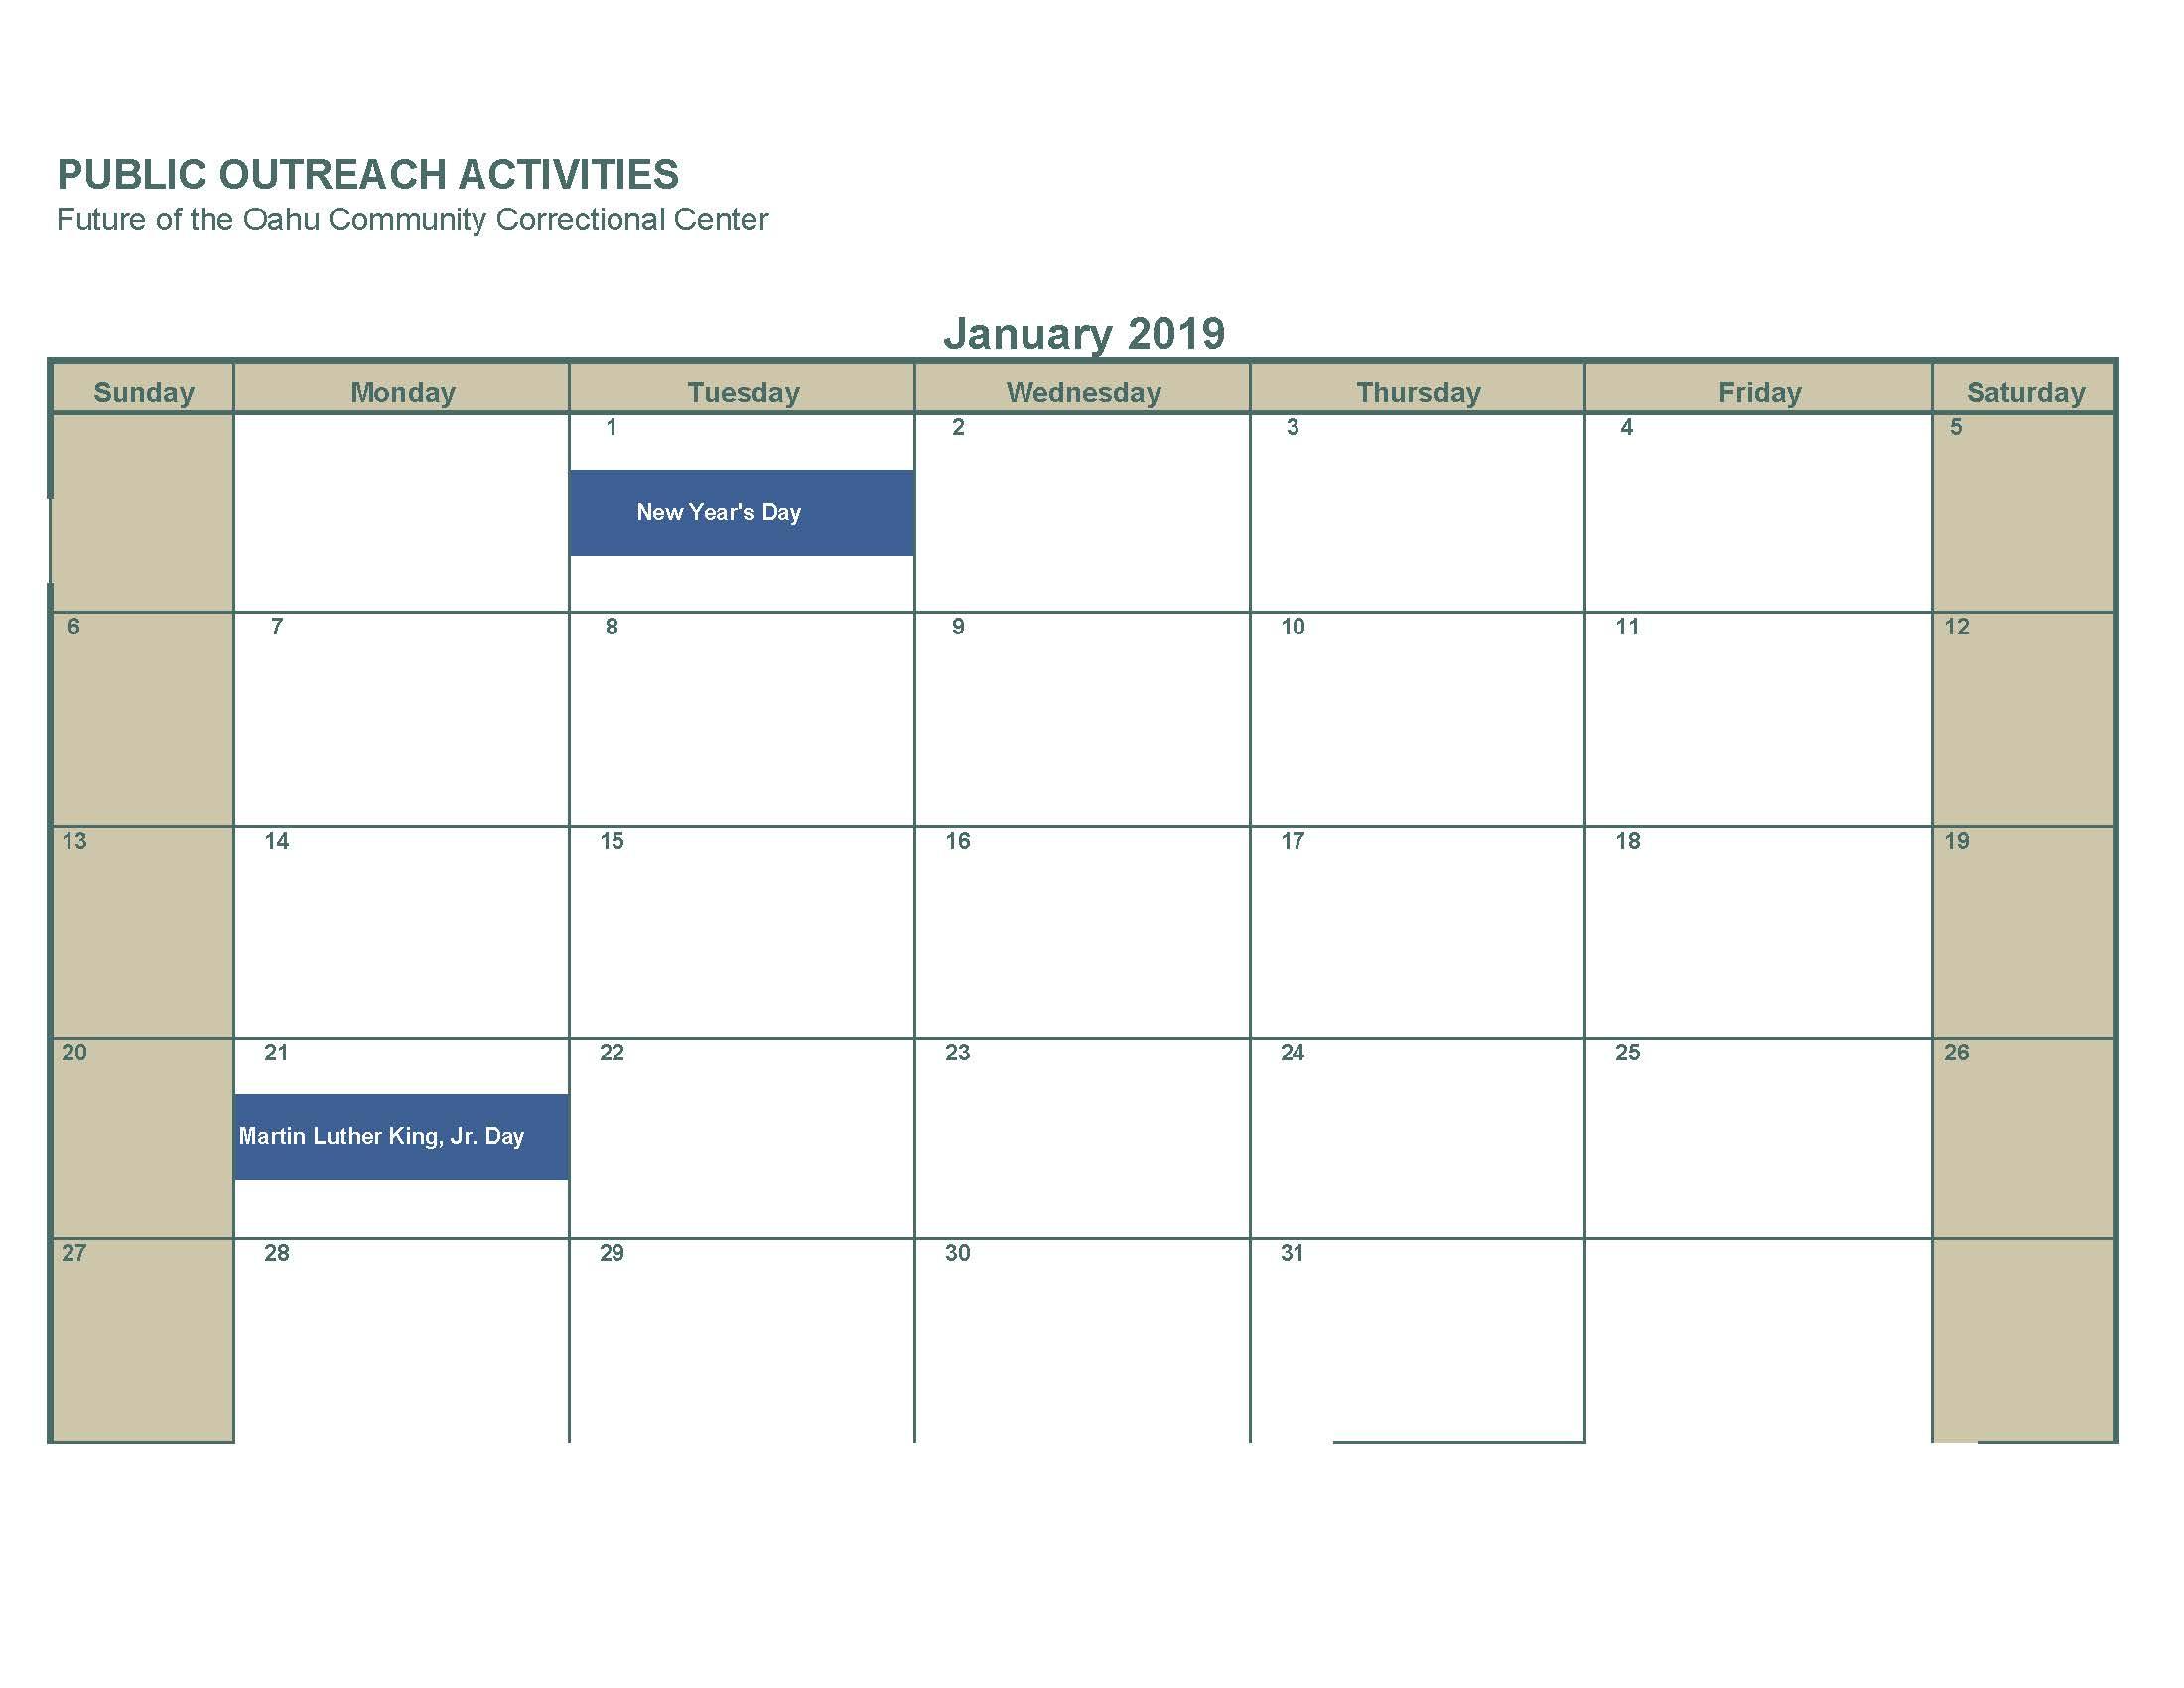 January 2019 no activities